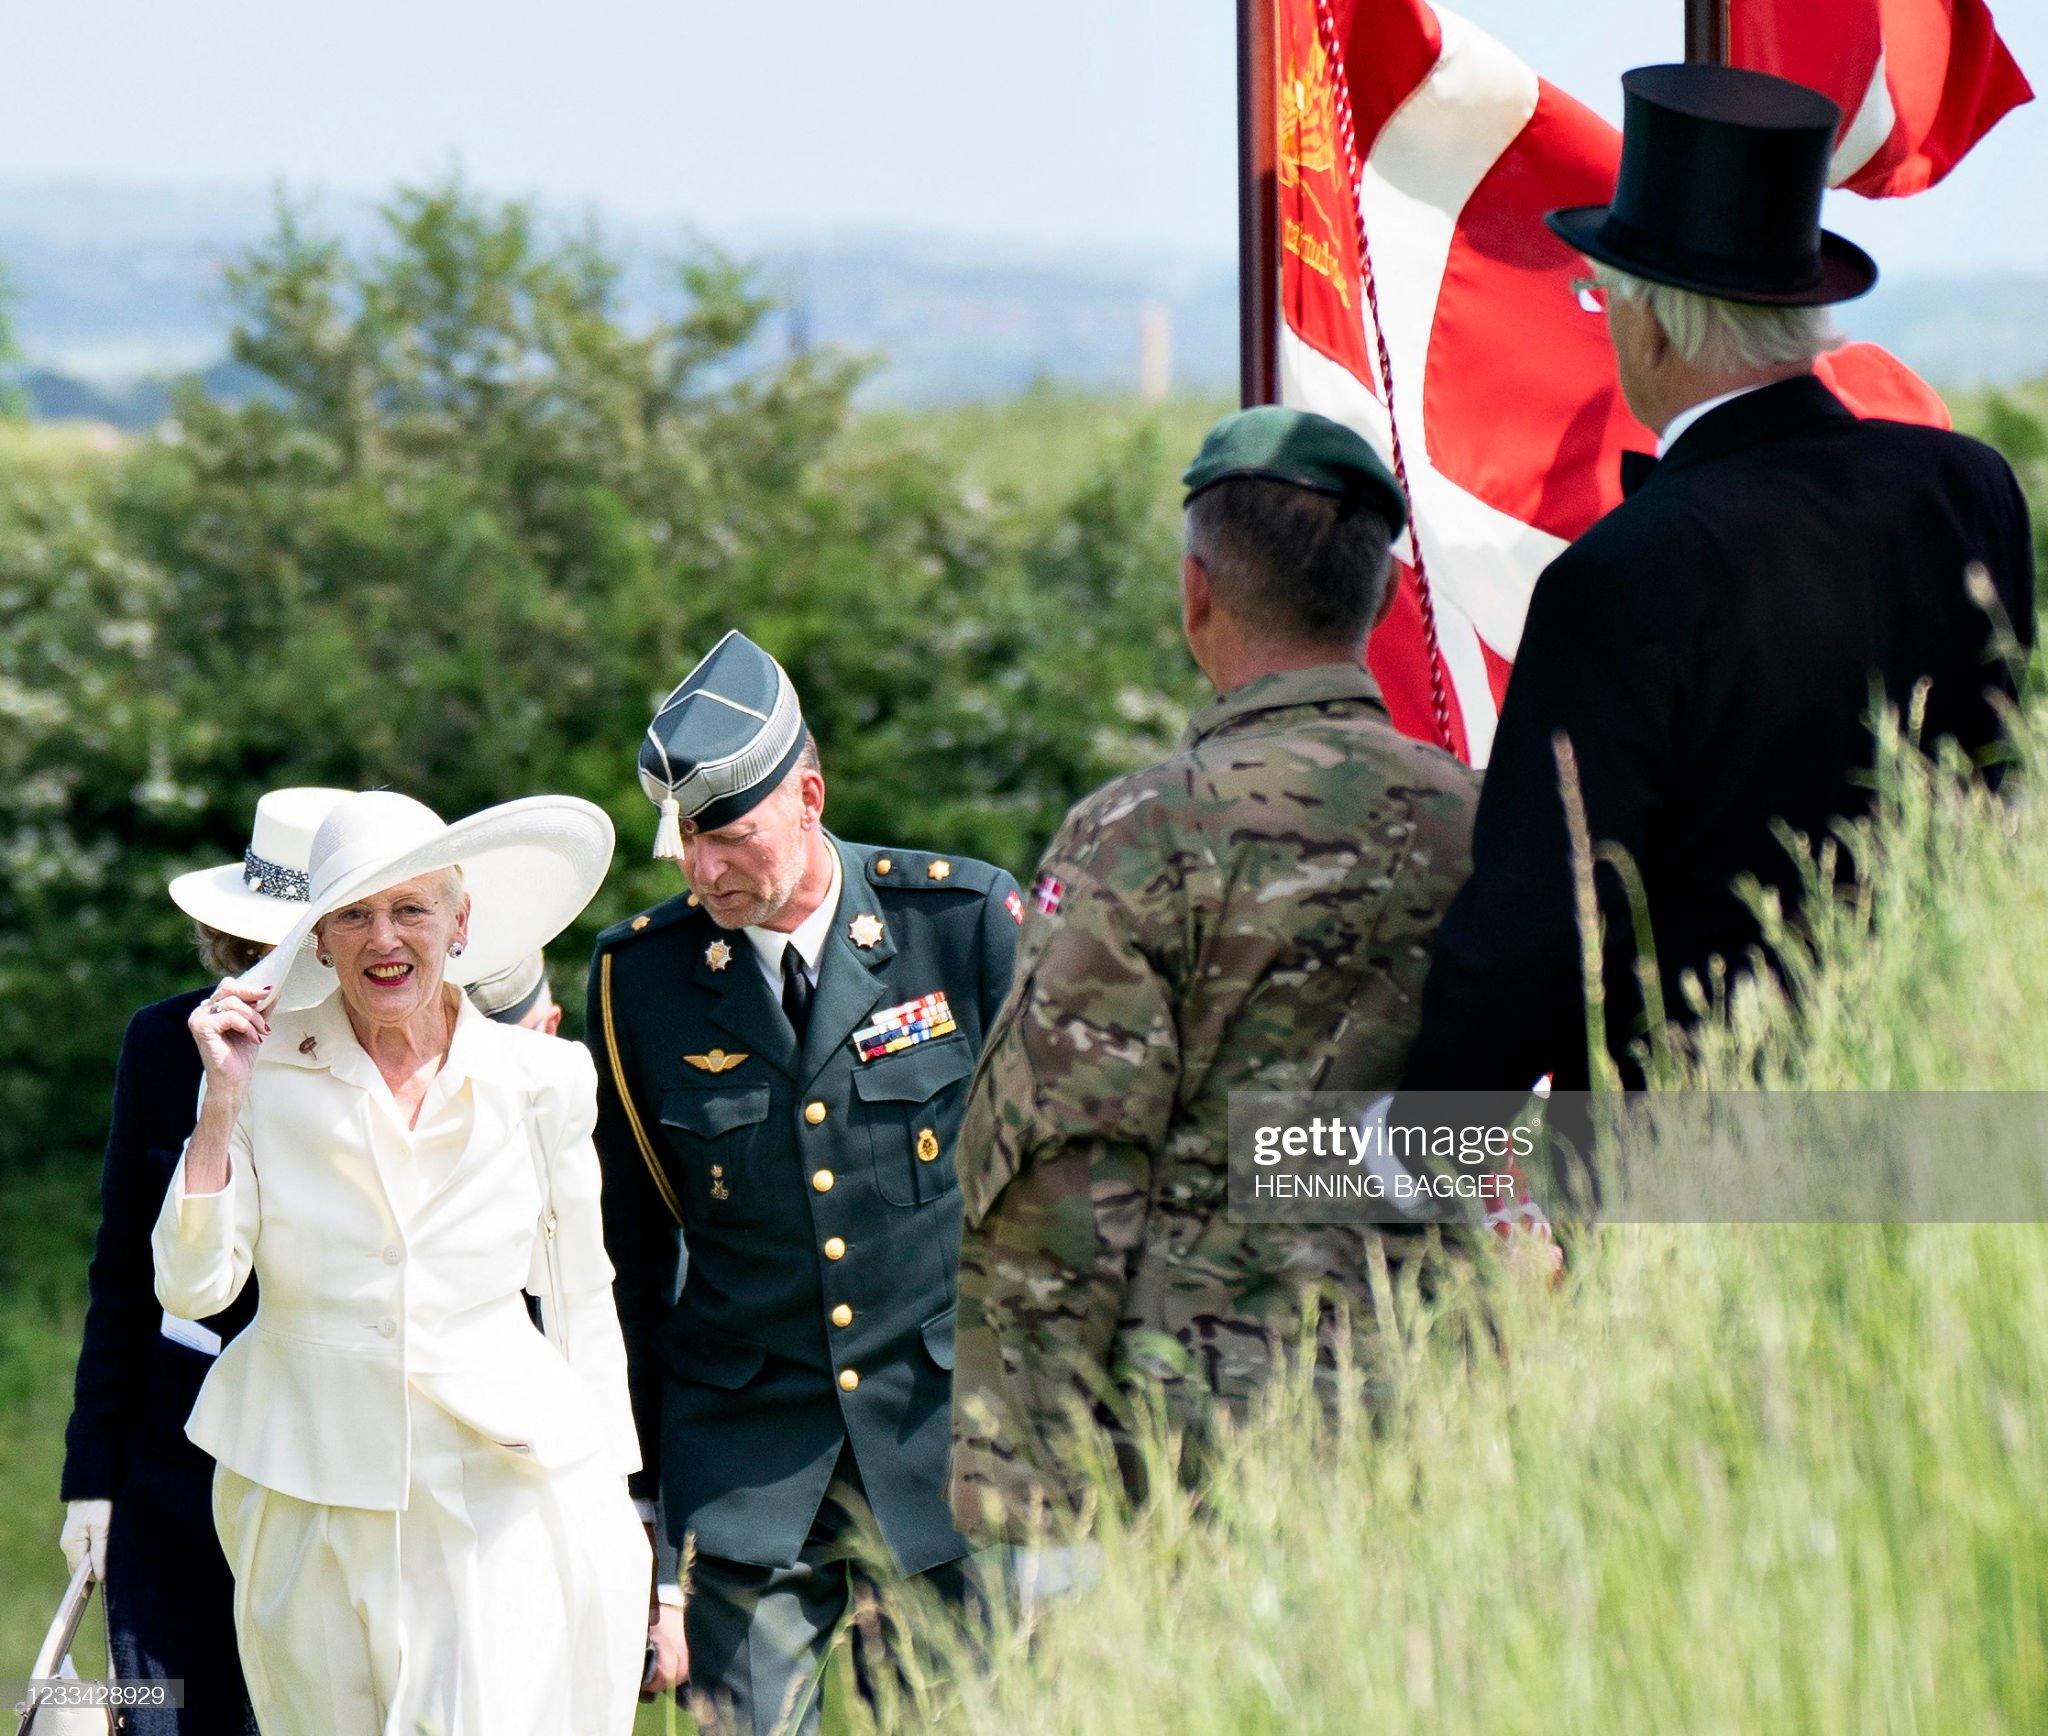 DENMARK-GERMANY-HISTORY-ROYALS-REUNIFICATION-ANNIVERSARY : News Photo